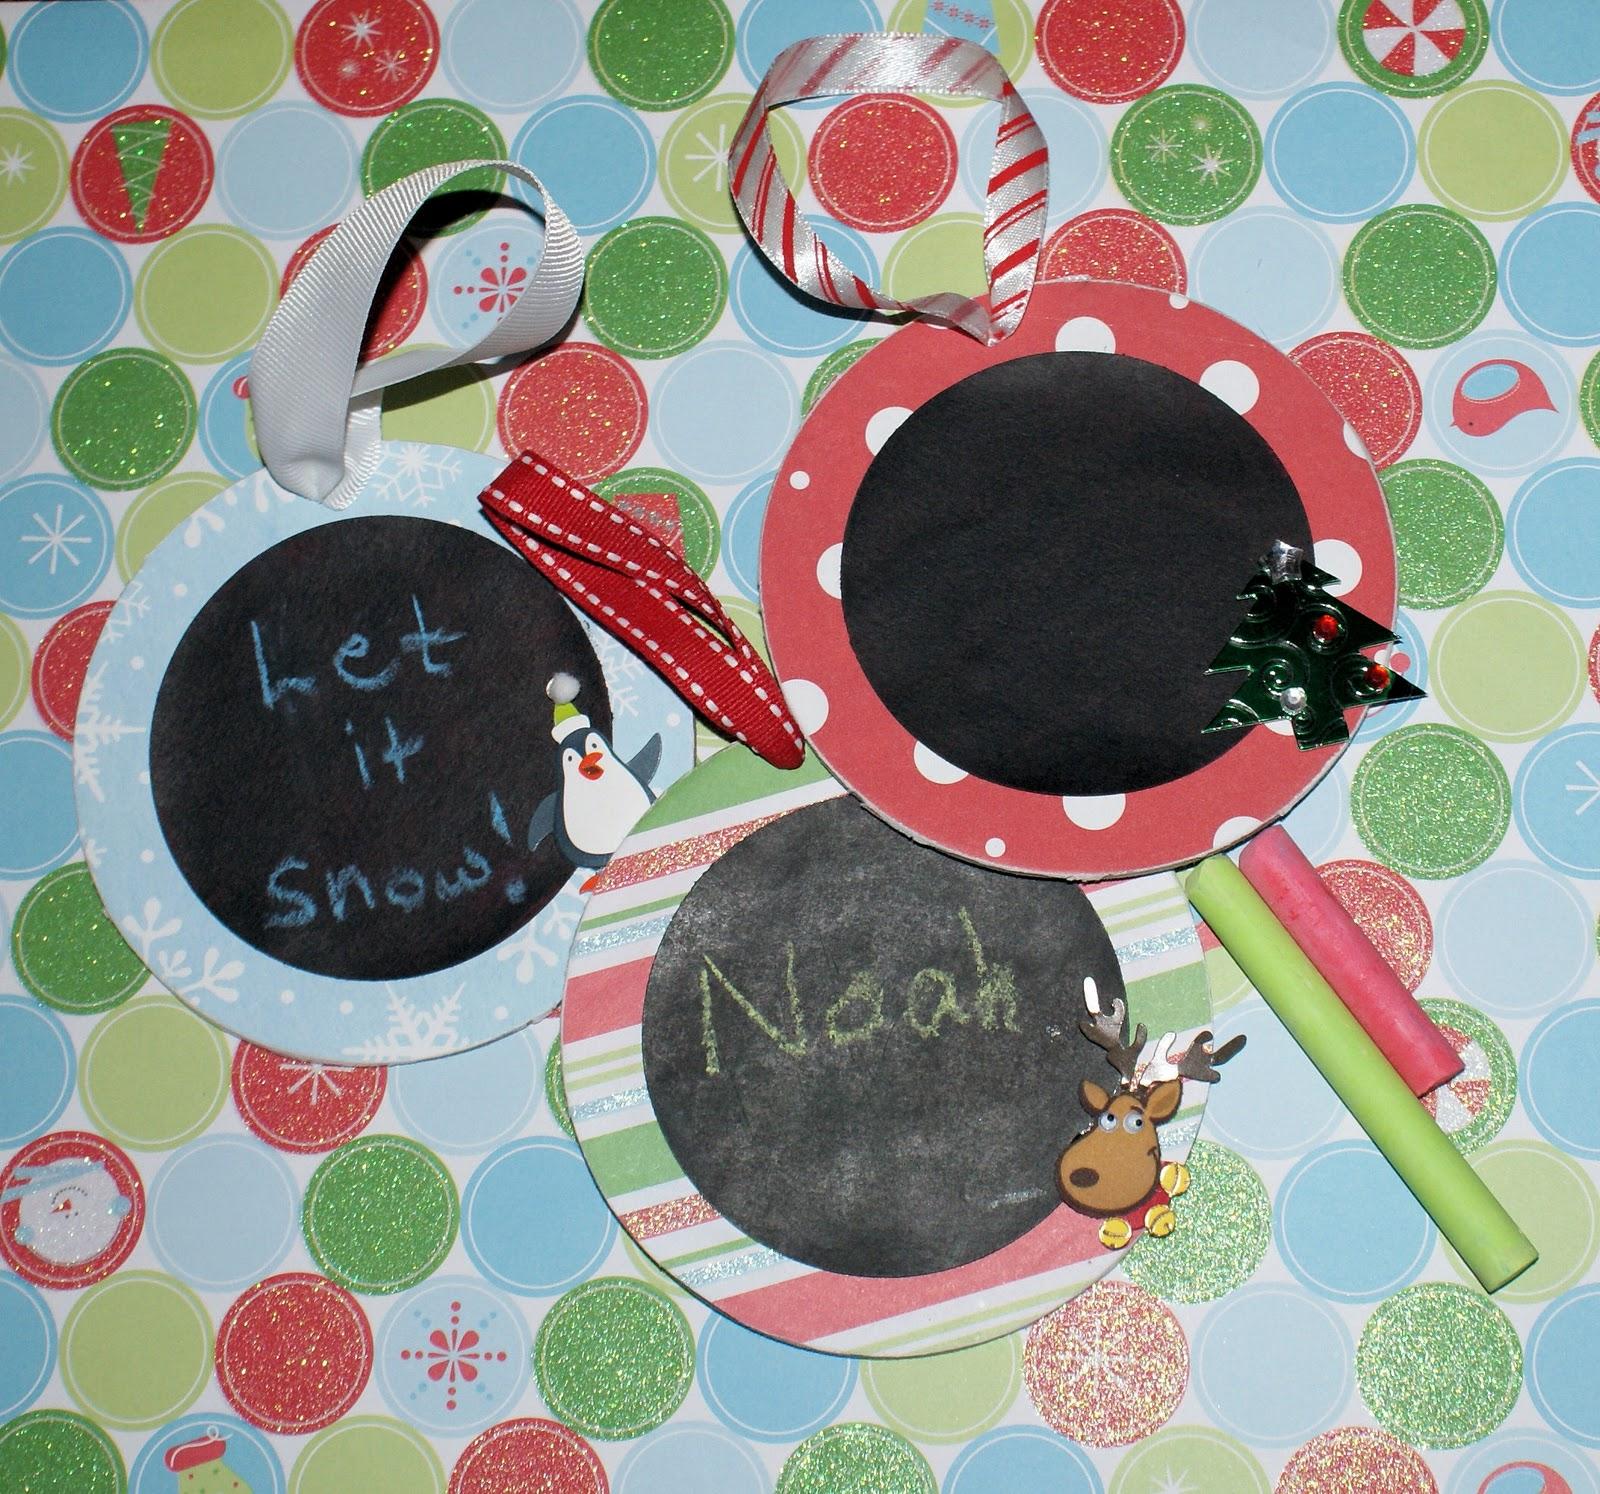 http://3.bp.blogspot.com/_chSWwsAhn0o/TOMYKS0VwxI/AAAAAAAACuQ/tiNnieFcP1k/s1600/chalkboard+ornie+trio.jpg